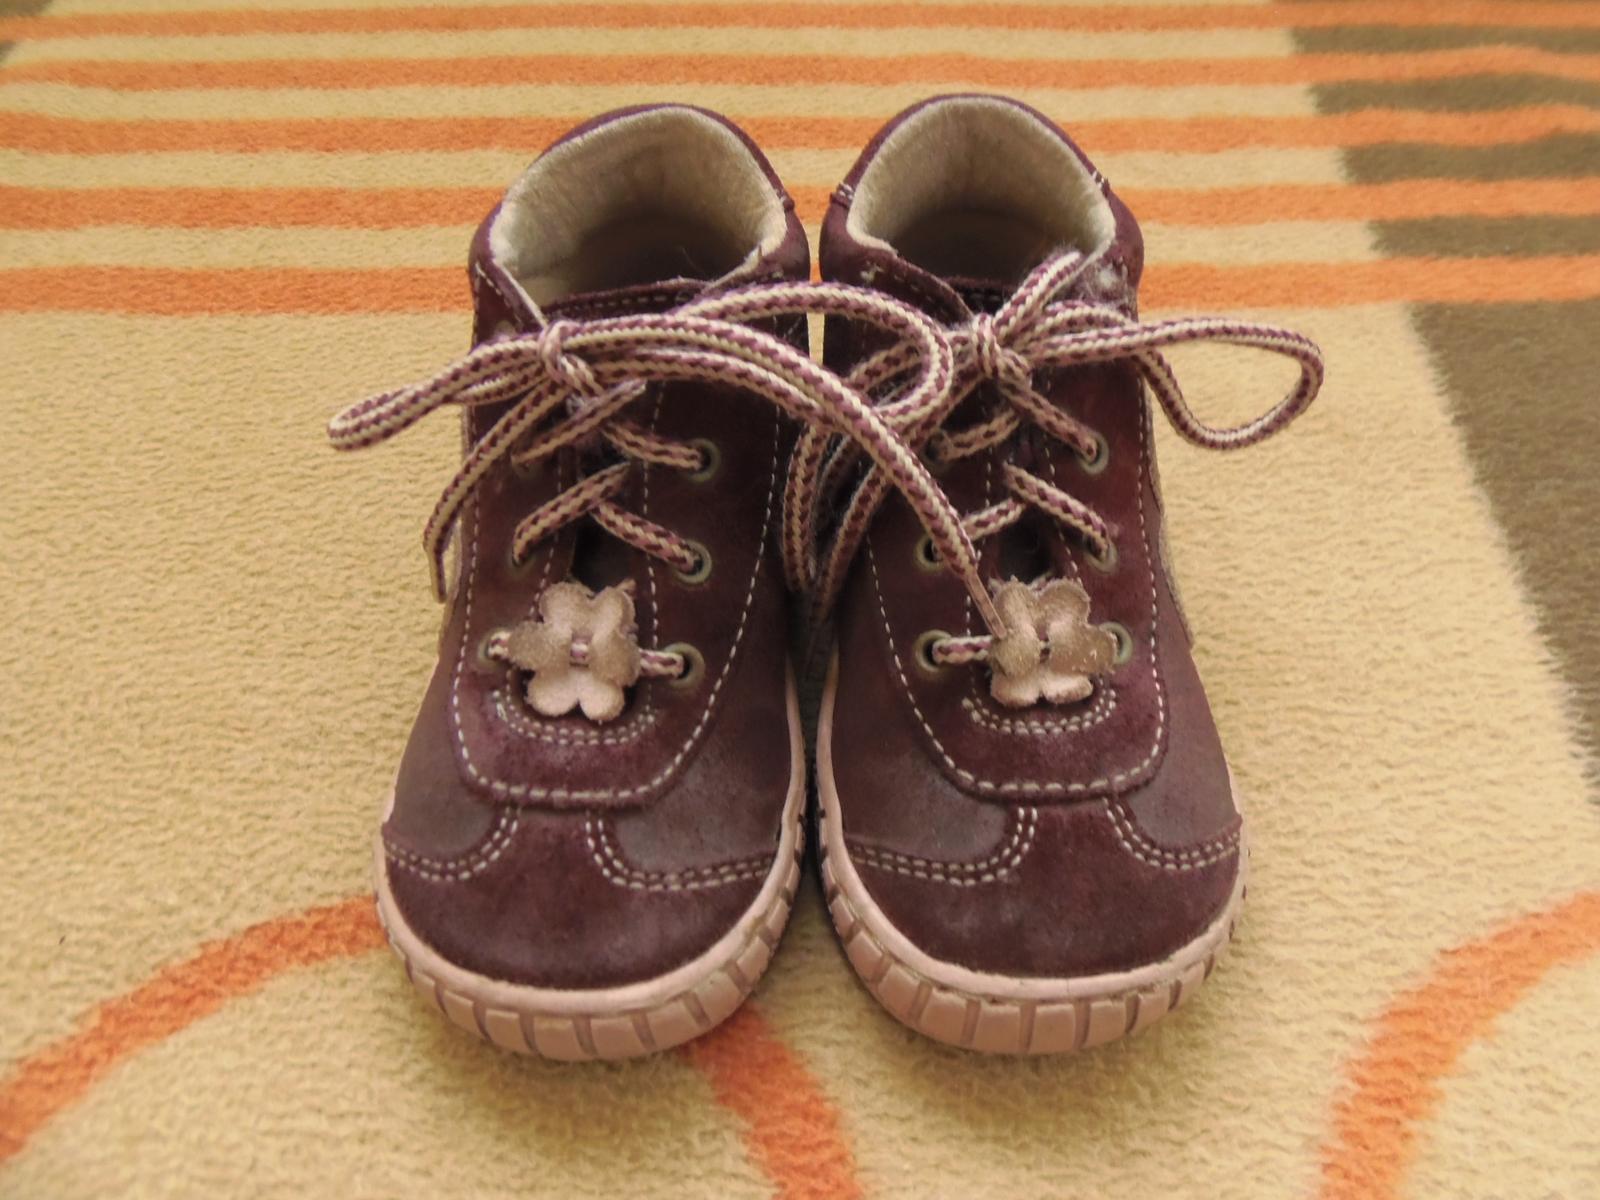 dcd0fa9a8eb Dětské boty pegres